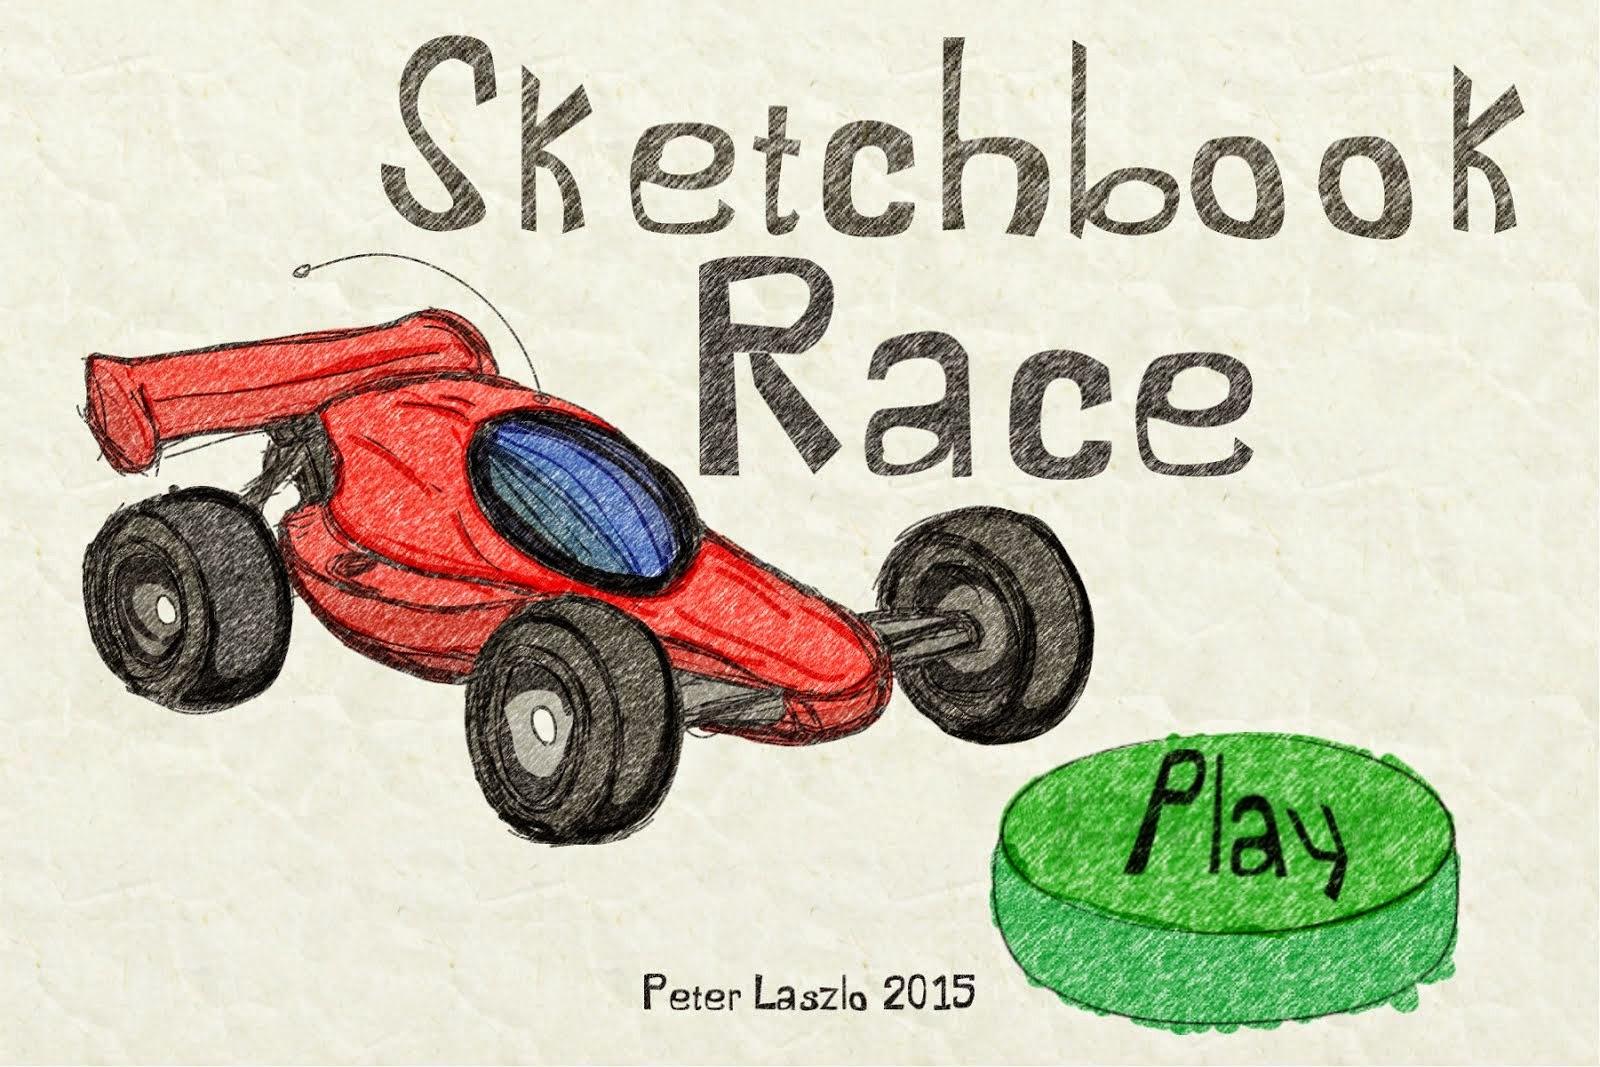 Sketchbook Race by Peter Laszlo